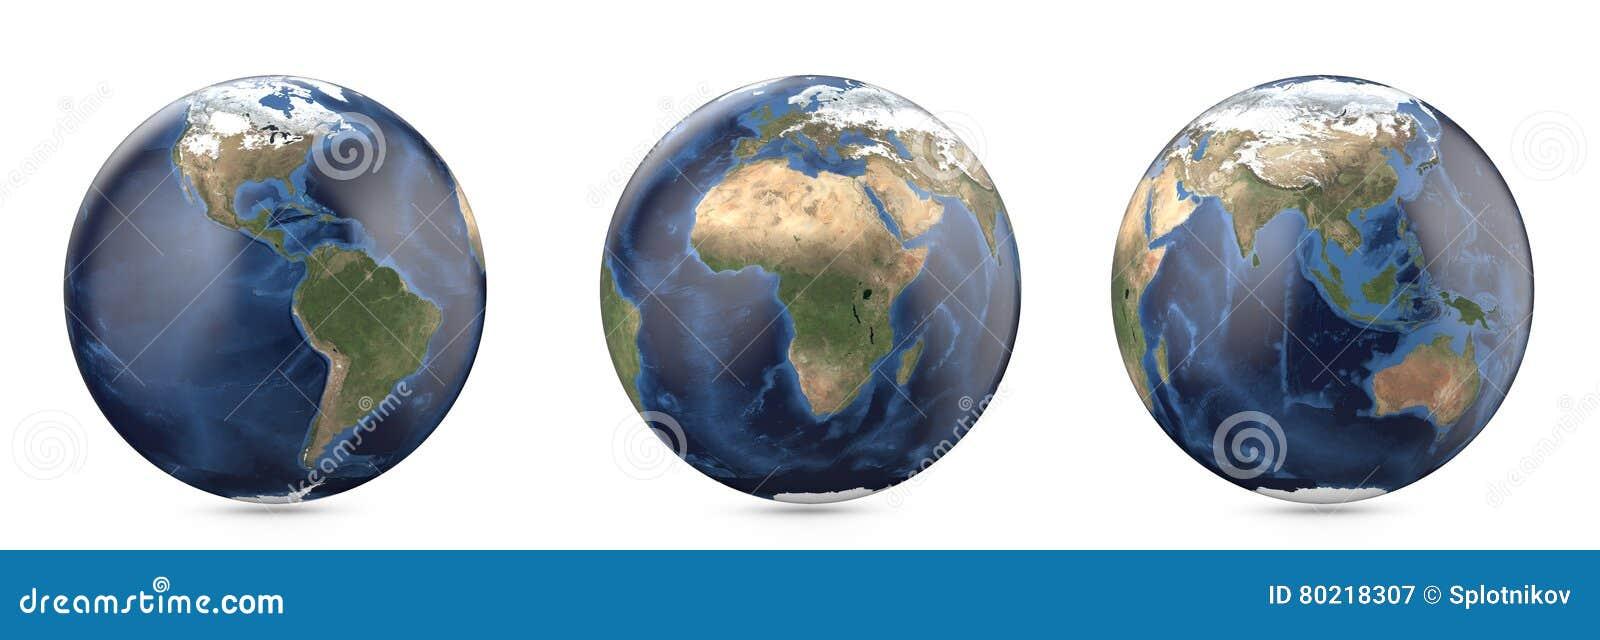 Planetjord utan moln Visning Amerika, Europa, Afrika, Asien, Australien kontinent